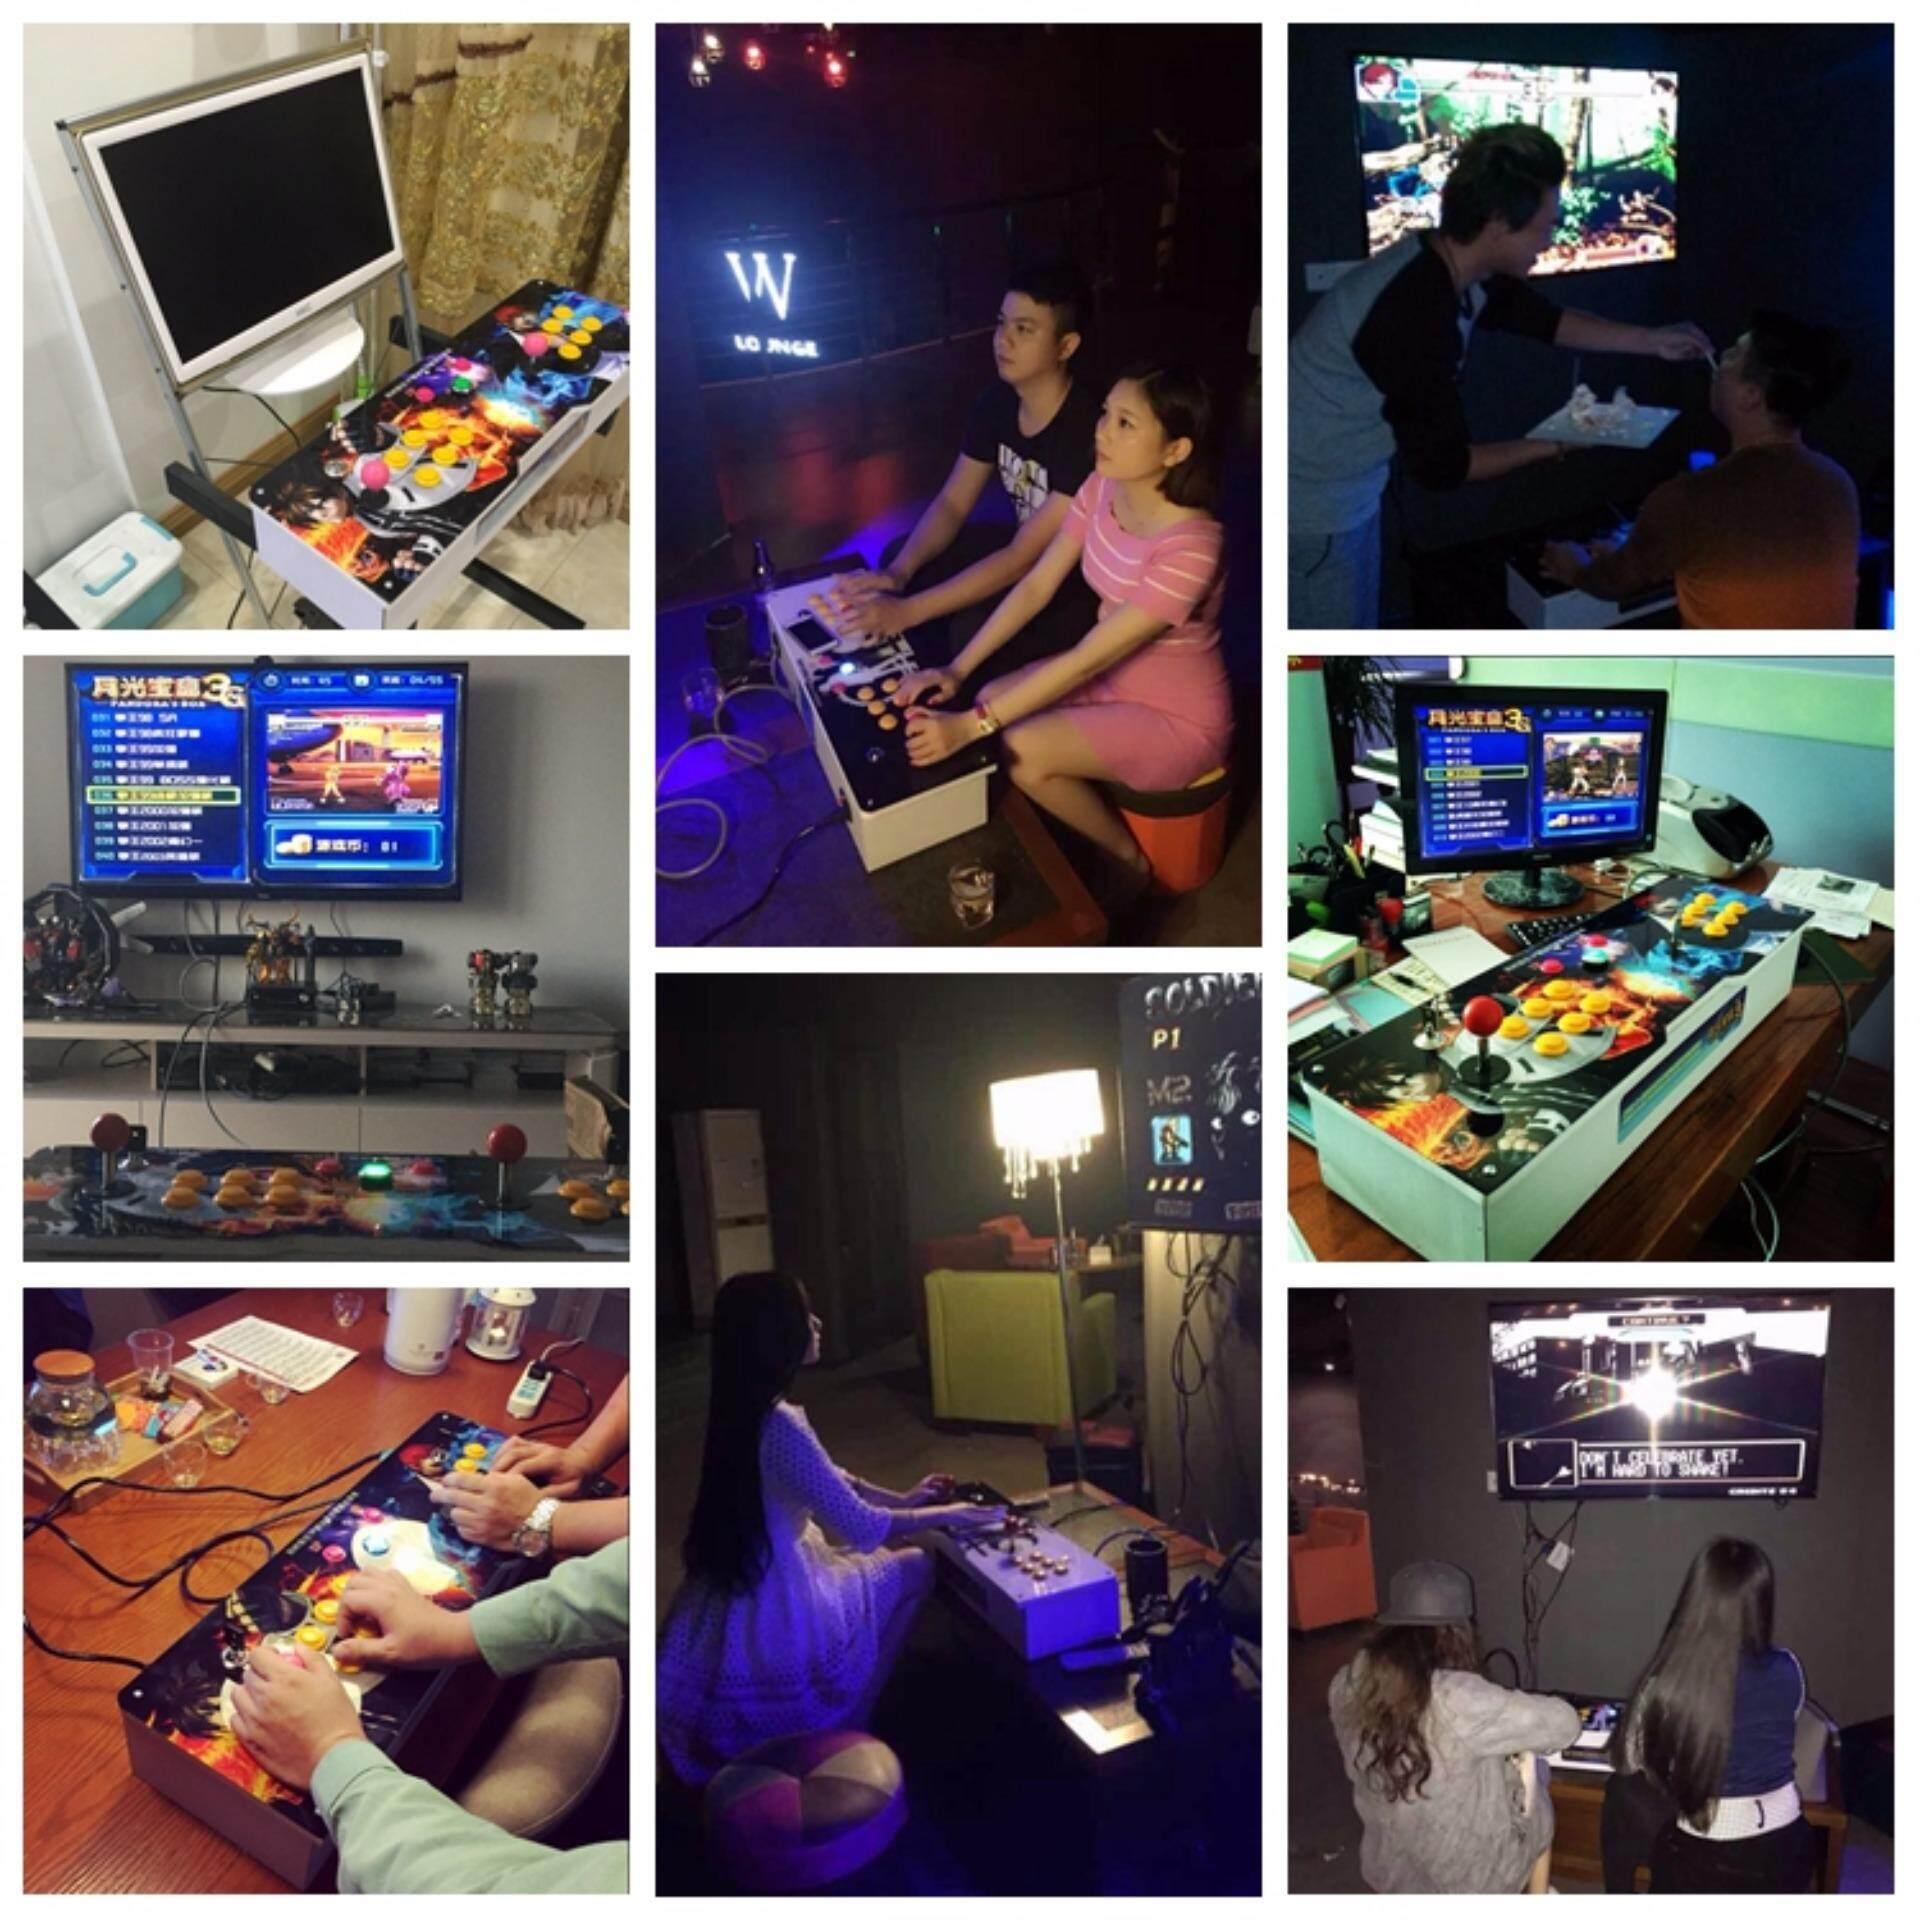 2 Player 645 in 1 Arcade Joystick Game Consoles Pandora Box 4(HDMI Cable)